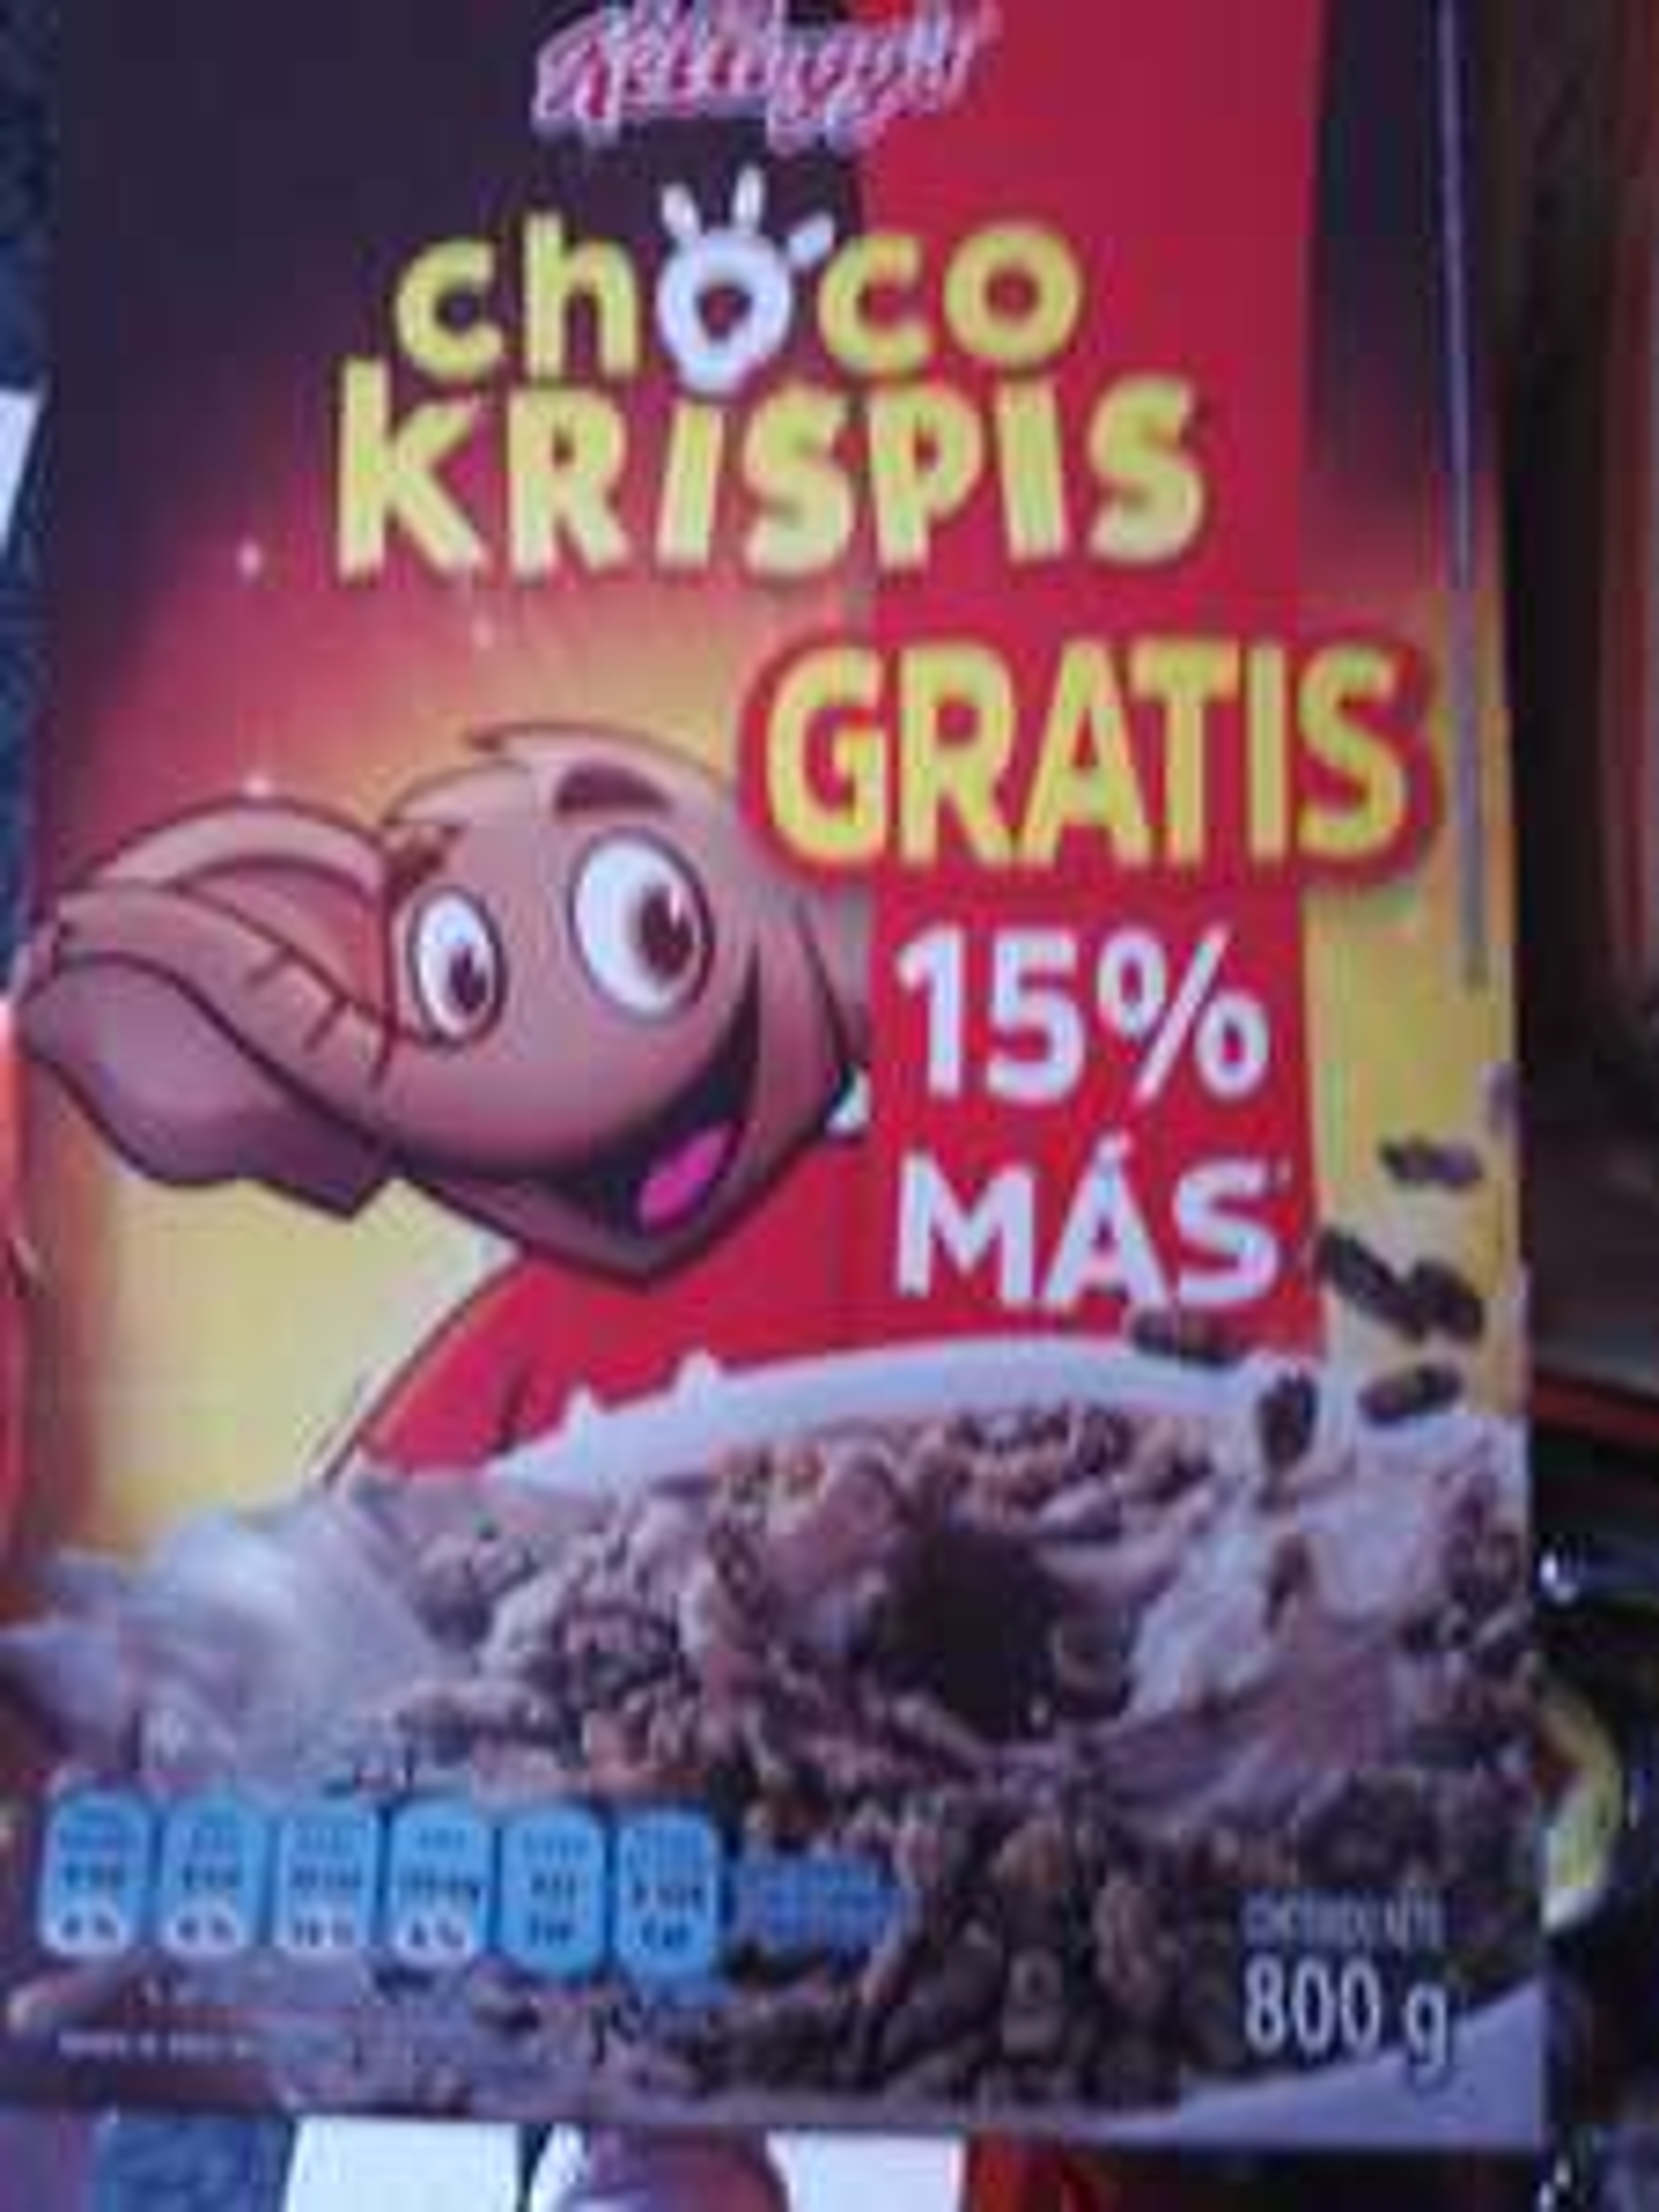 Chedraui: Choco krispis